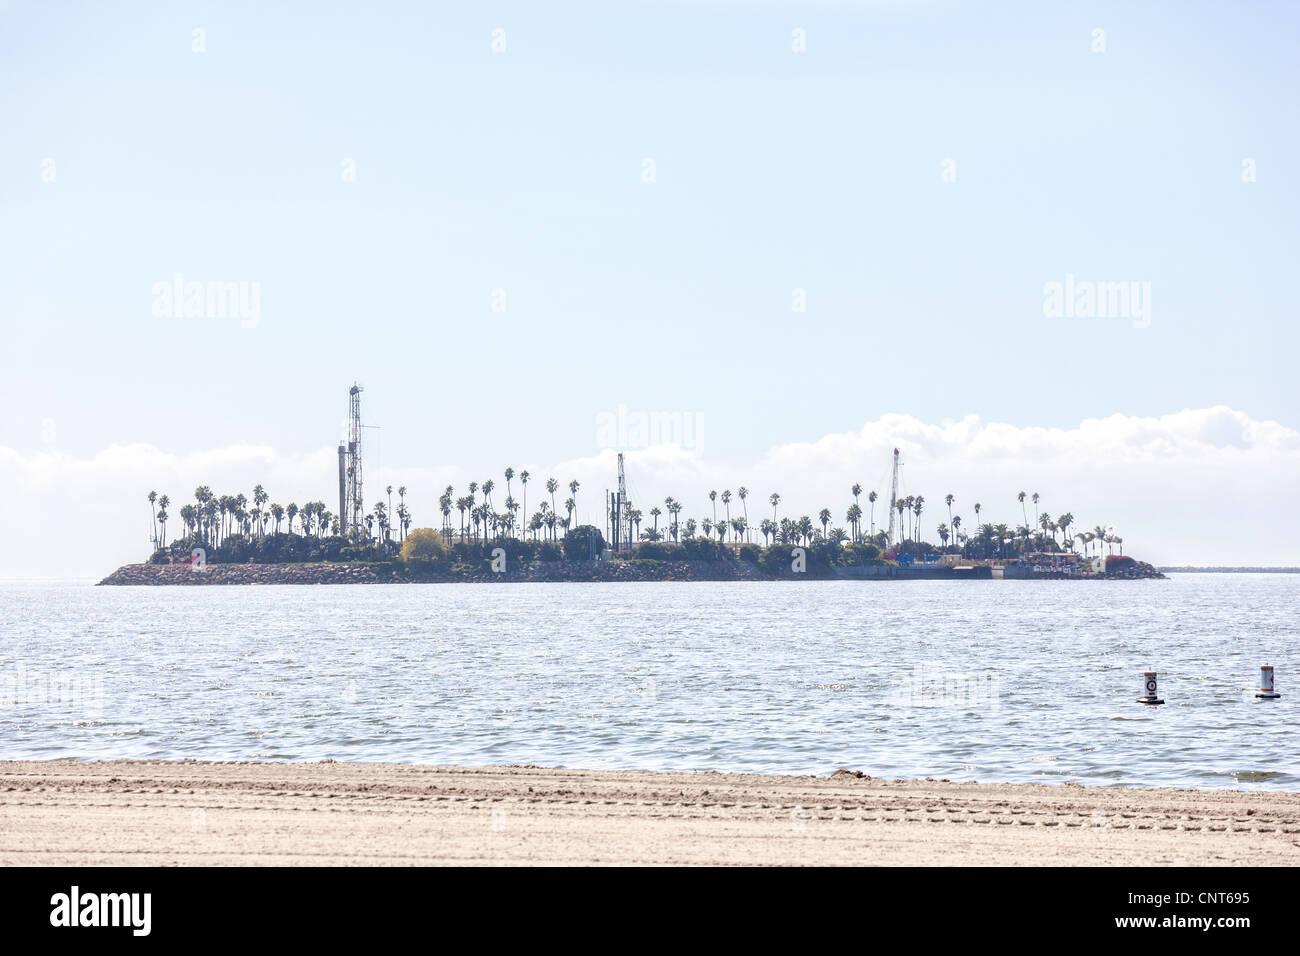 http://c7.alamy.com/comp/CNT695/long-beach-california-thums-island-chaffee-offshore-oil-drilling-platform-CNT695.jpg